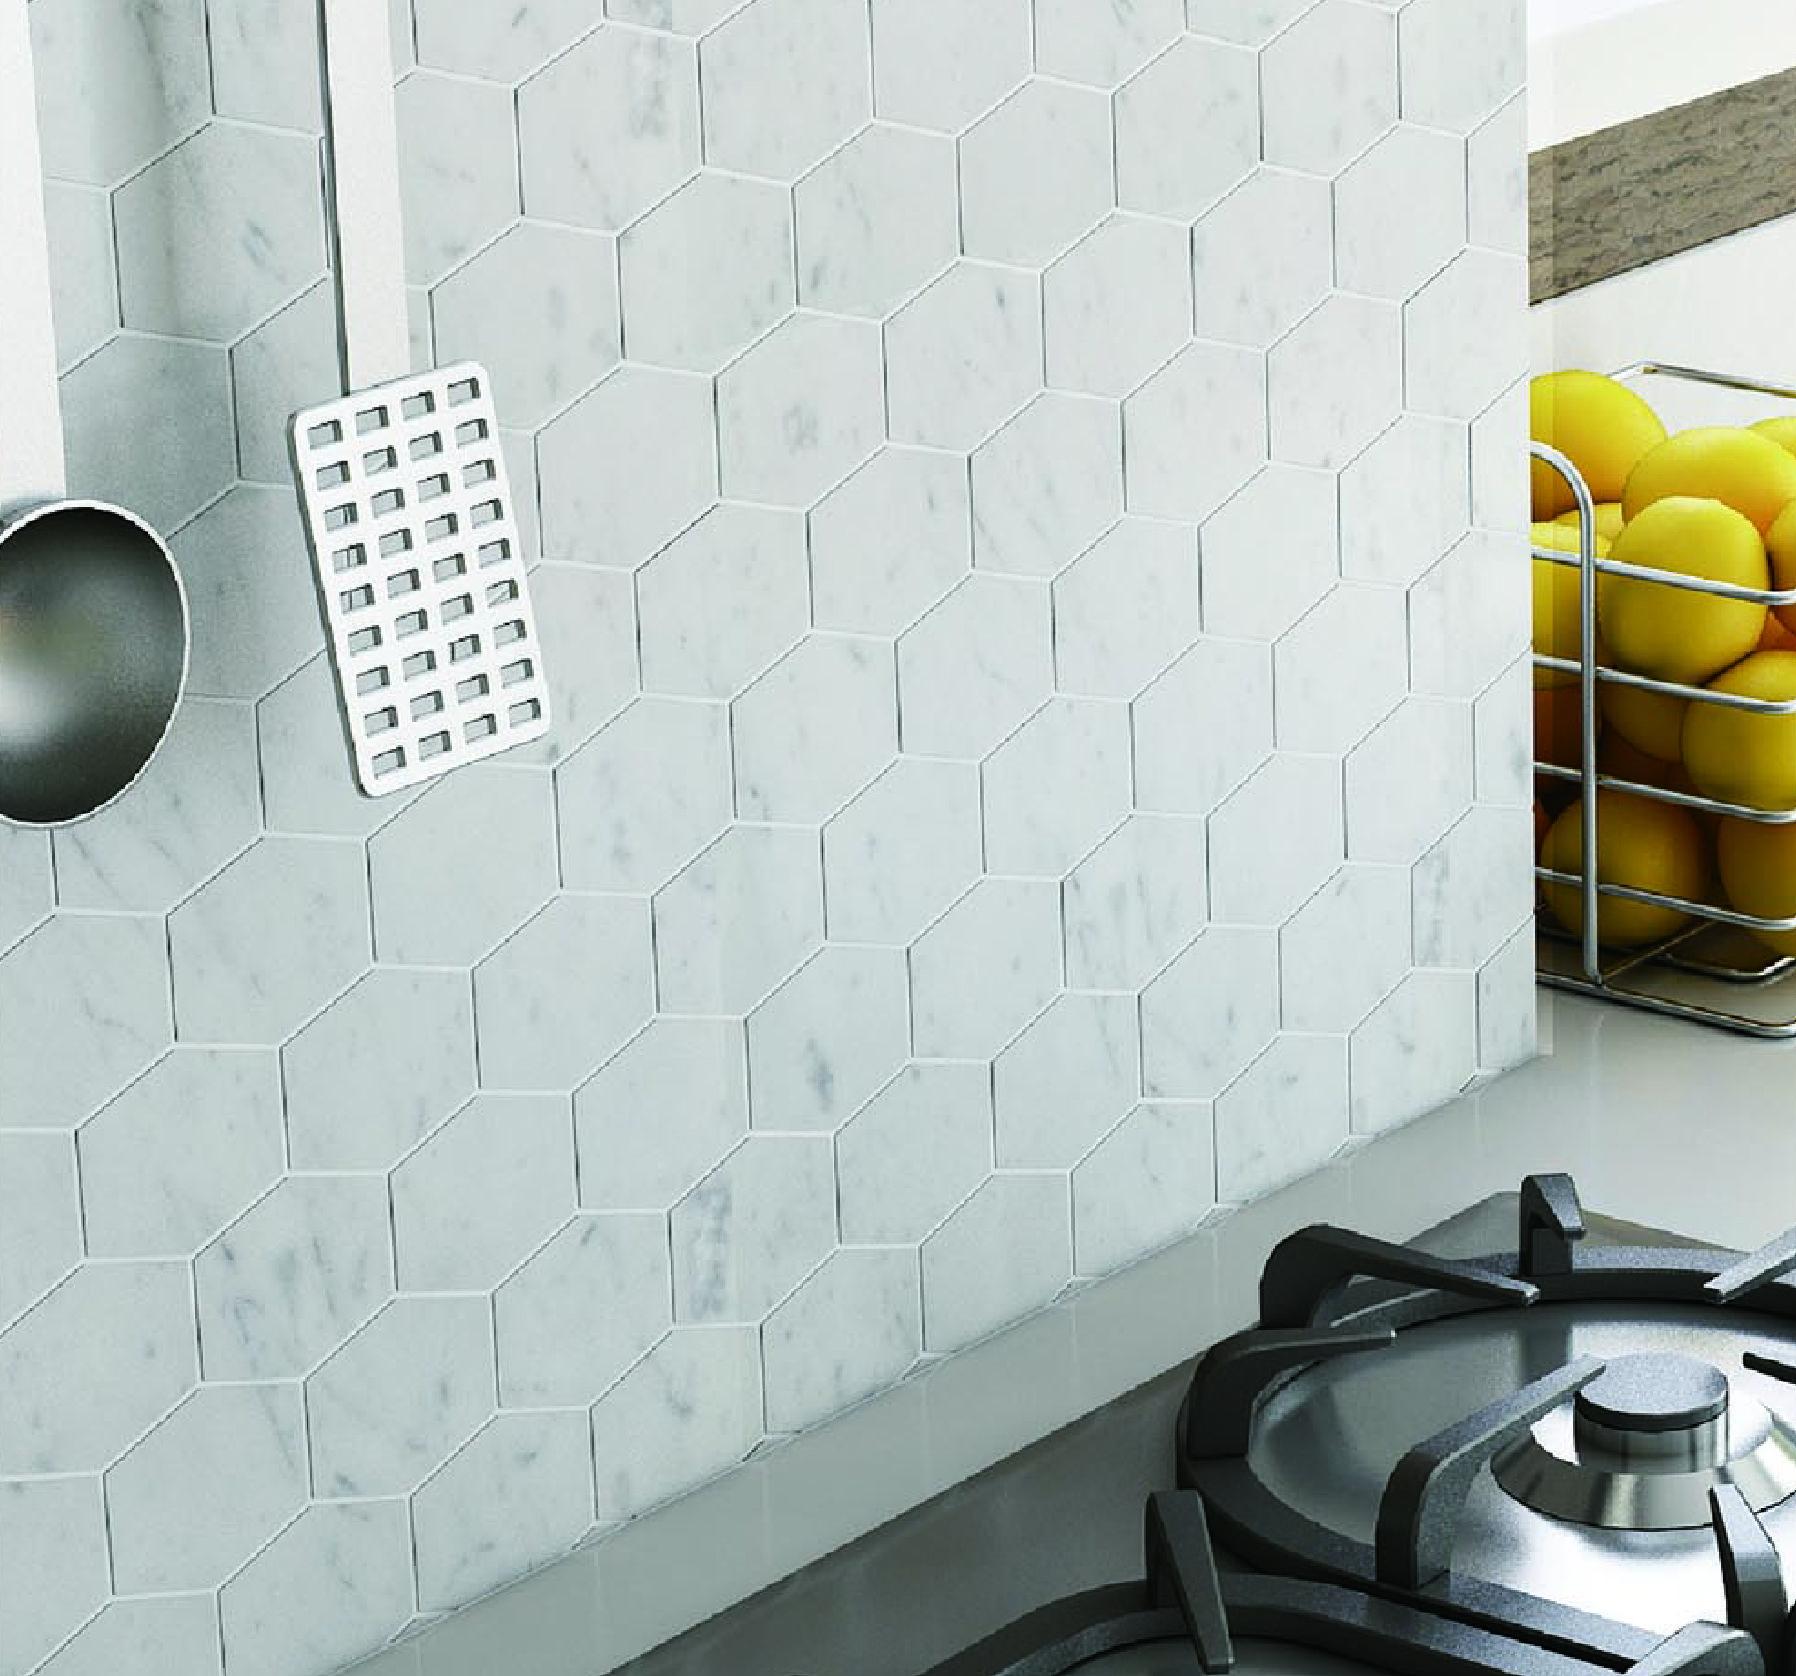 Bianco carrara hexagon 2 marble mosaic tile 12x12 carrara marble a bianco carrara hexagon marble mosaic httpstilebuys dailygadgetfo Gallery